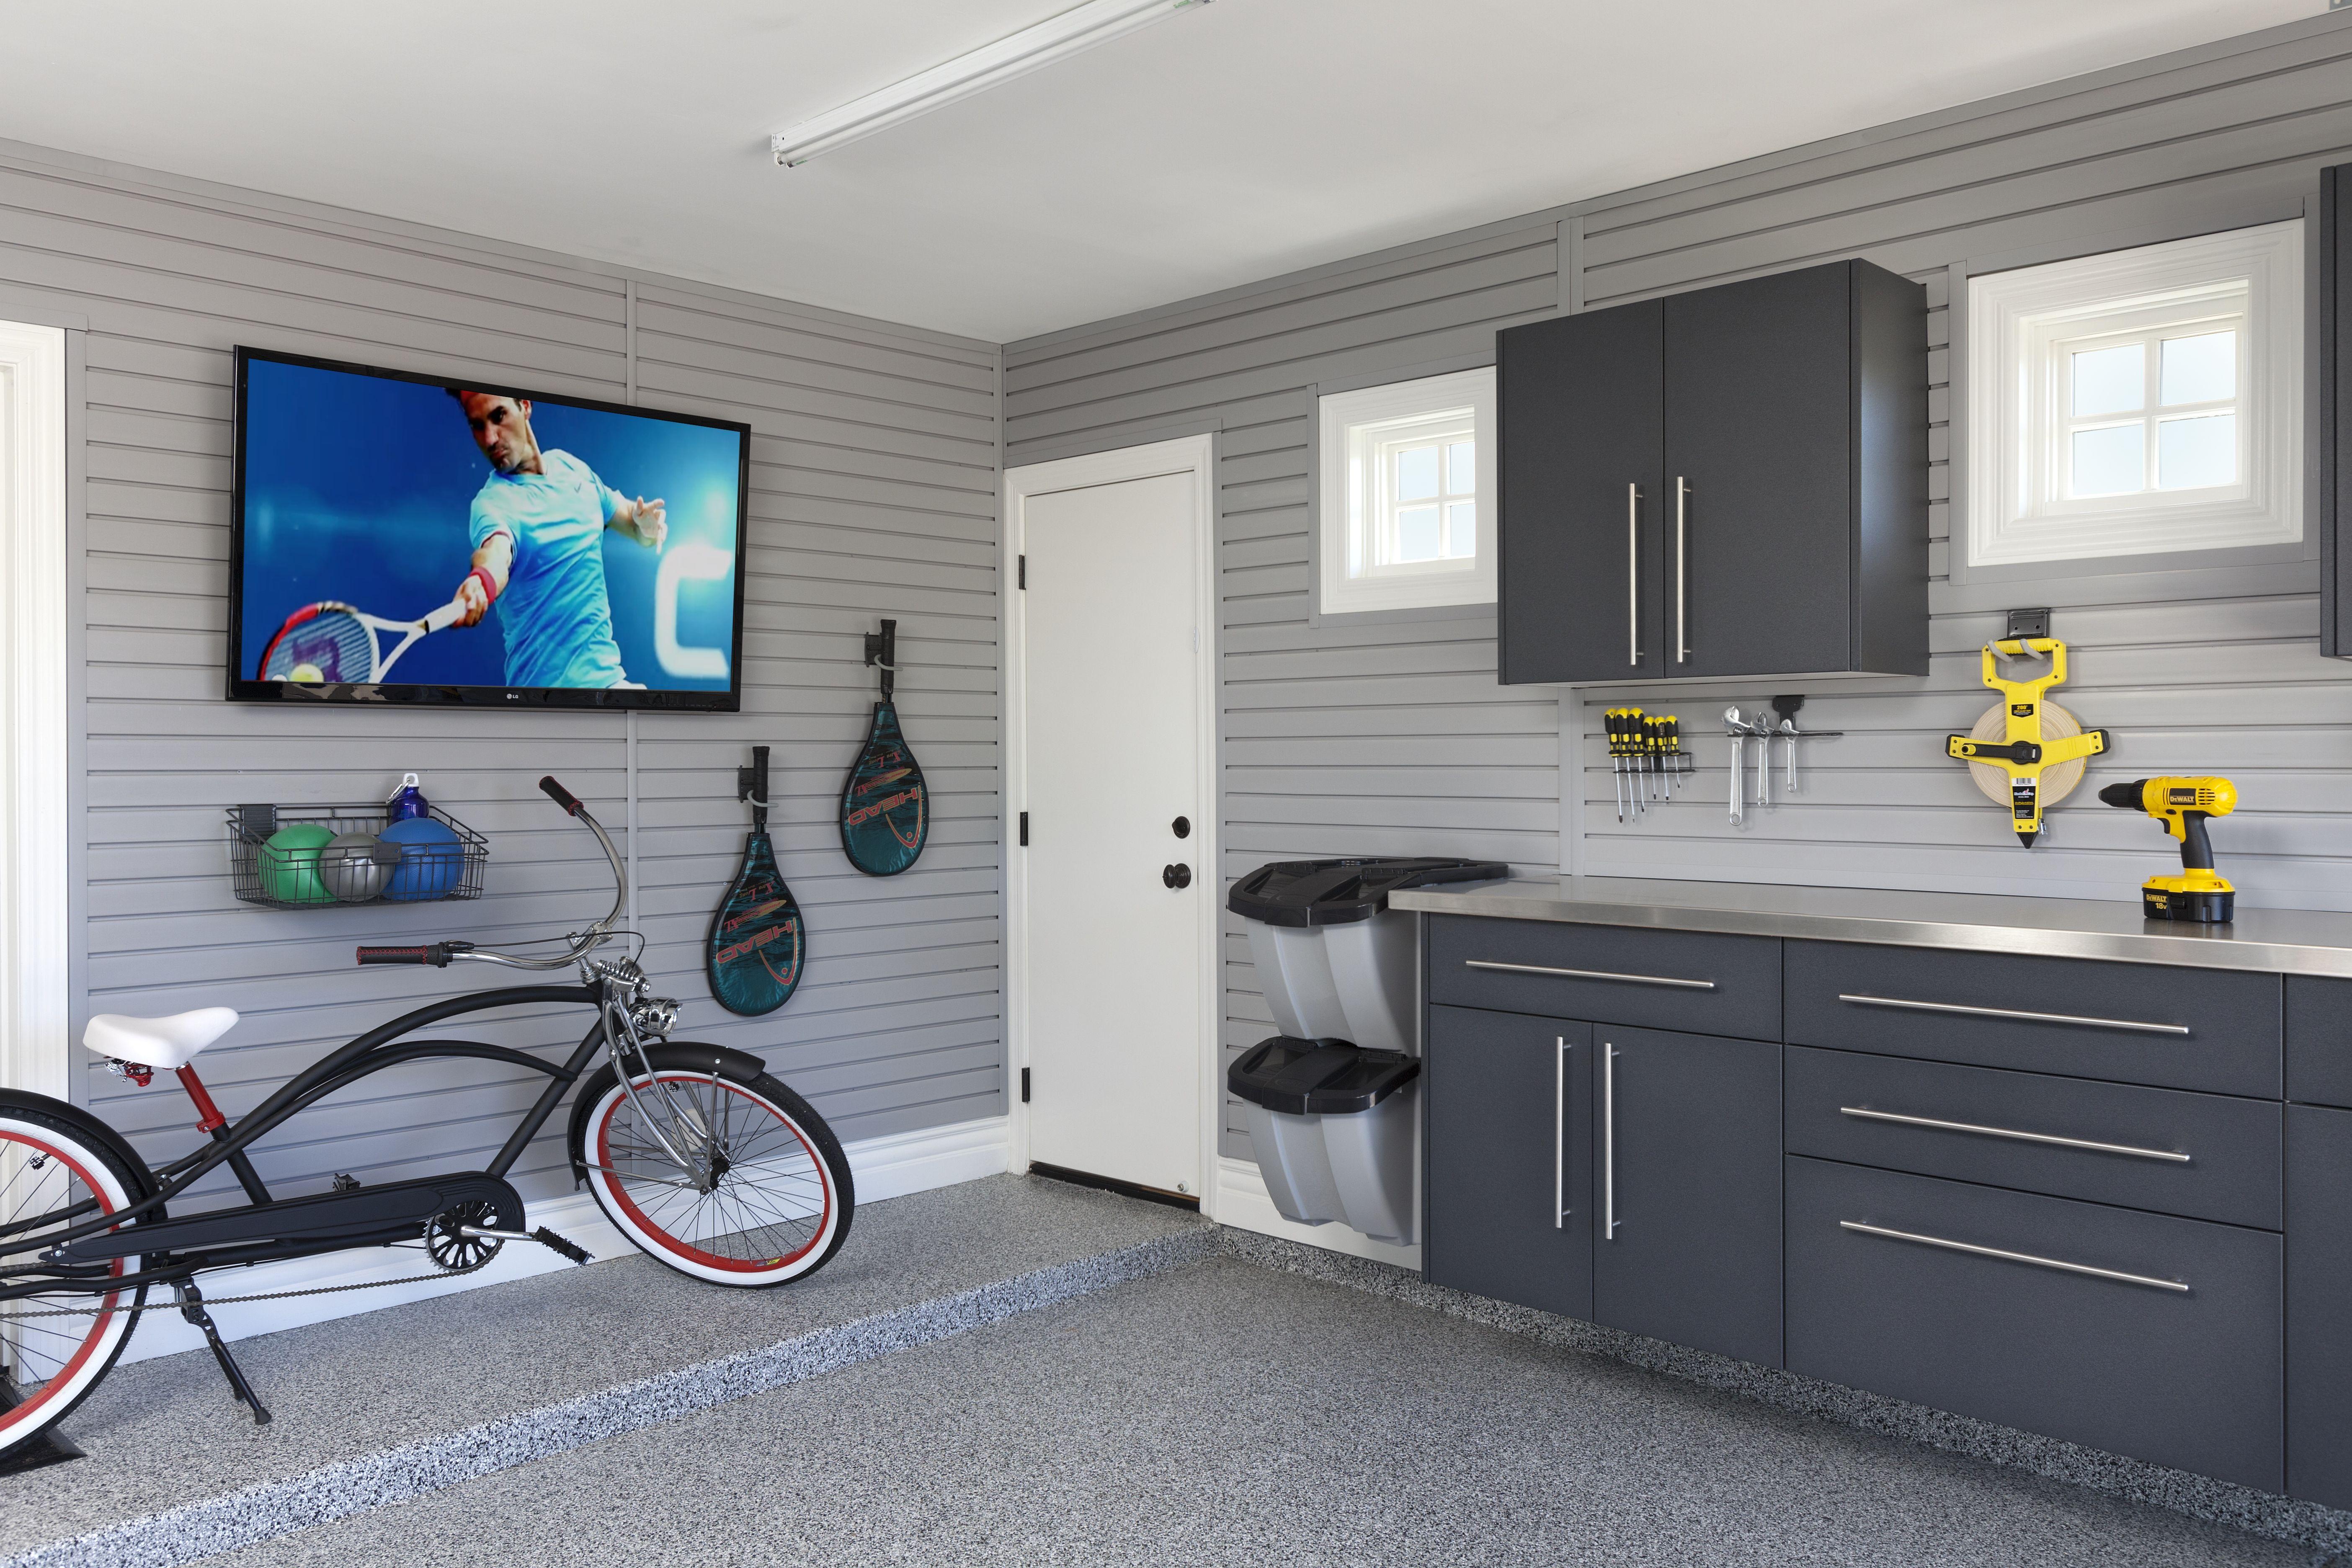 Man Cave Garage Storagebydesign Ca Slat Wall Slatwall Garage Garage Cabinets